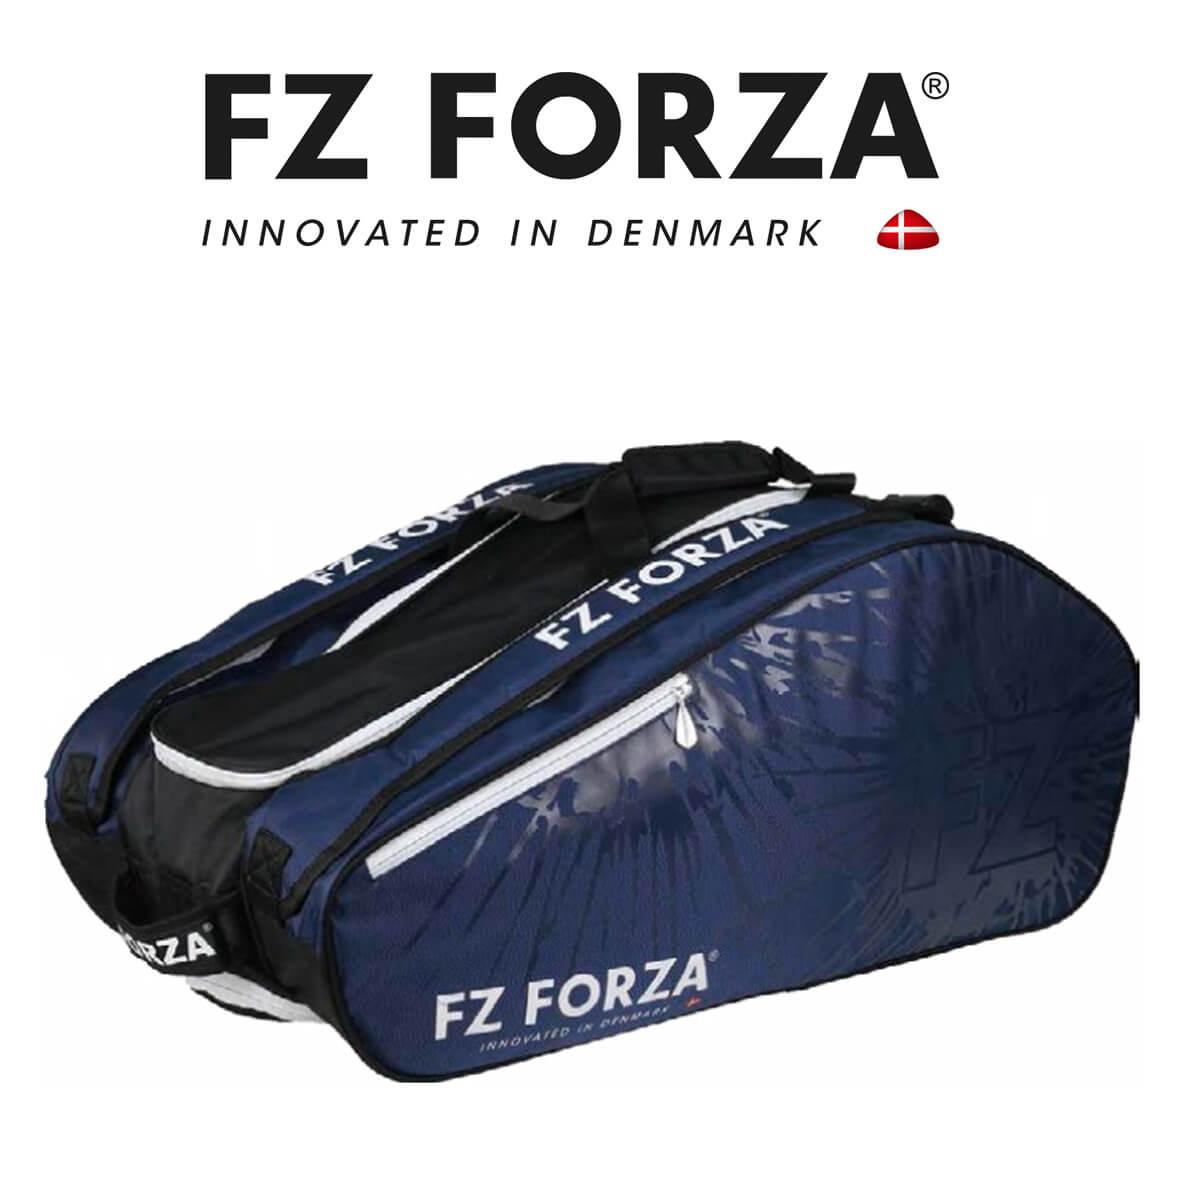 FZ FORZA 302621 ラケットバッグ(15本用) バドミントン フォーザ